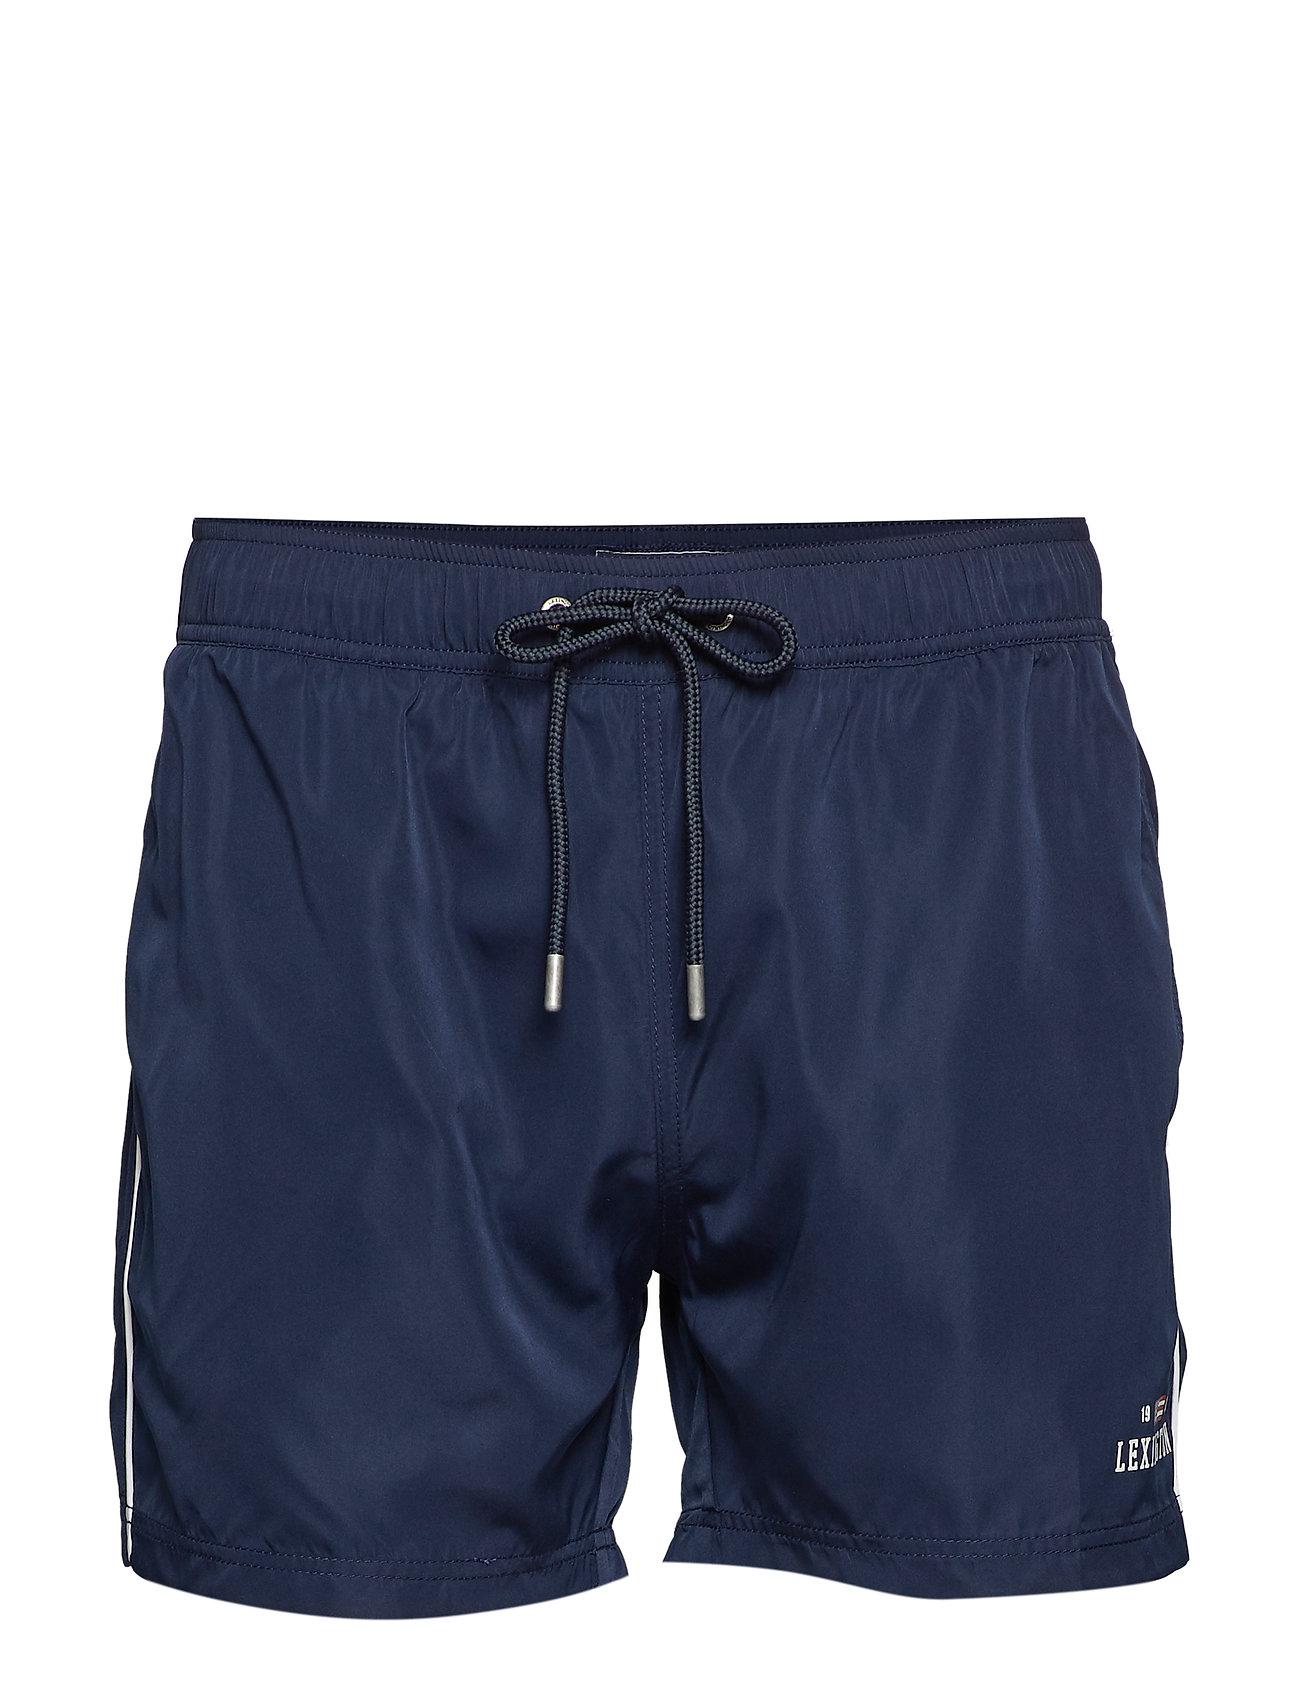 Lexington Clothing Elliot Swimshorts - NAVY BLUE